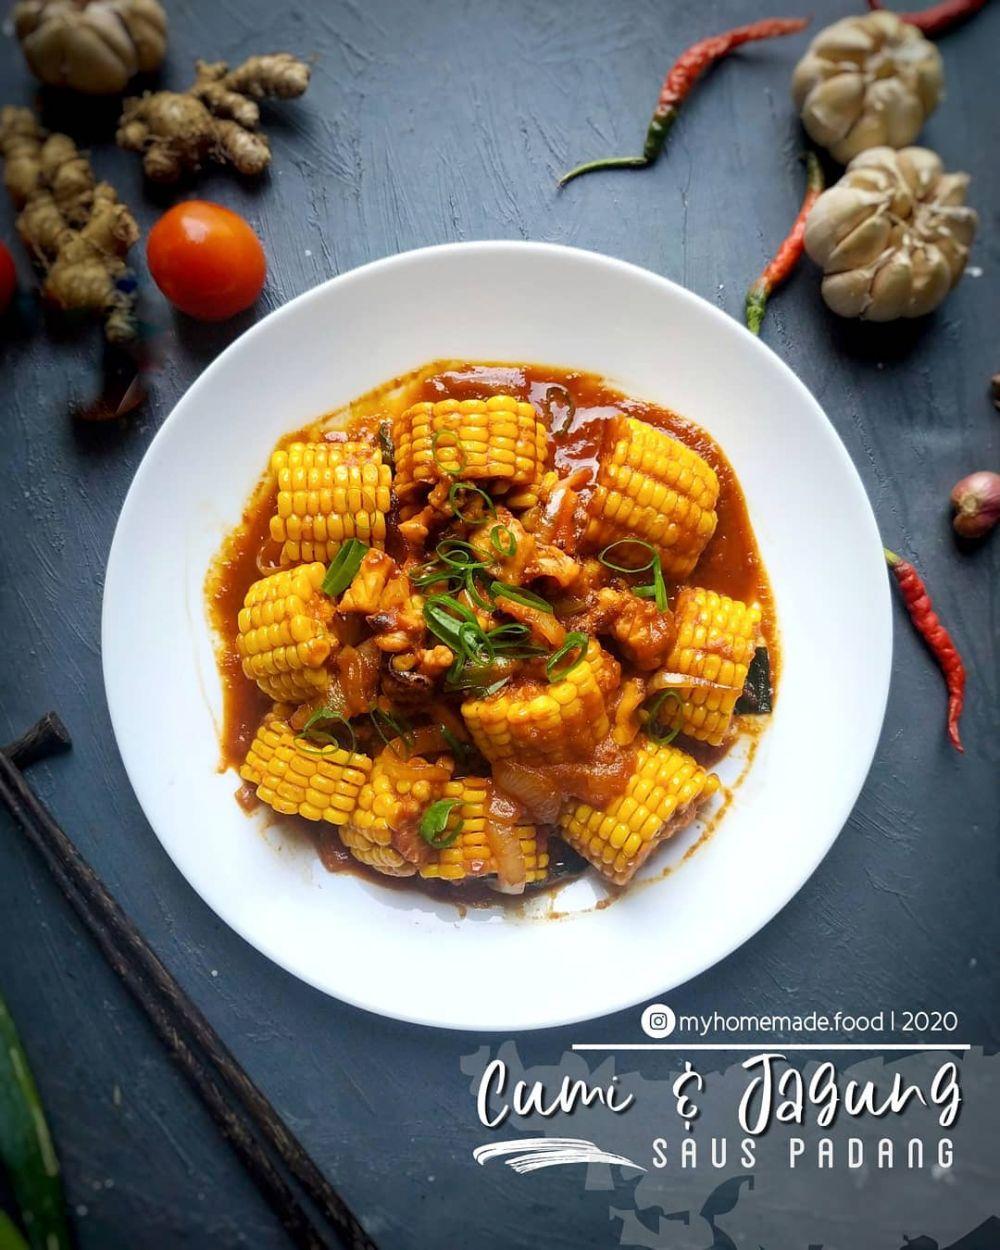 Resep masakan saus padang © 2020 brilio.net